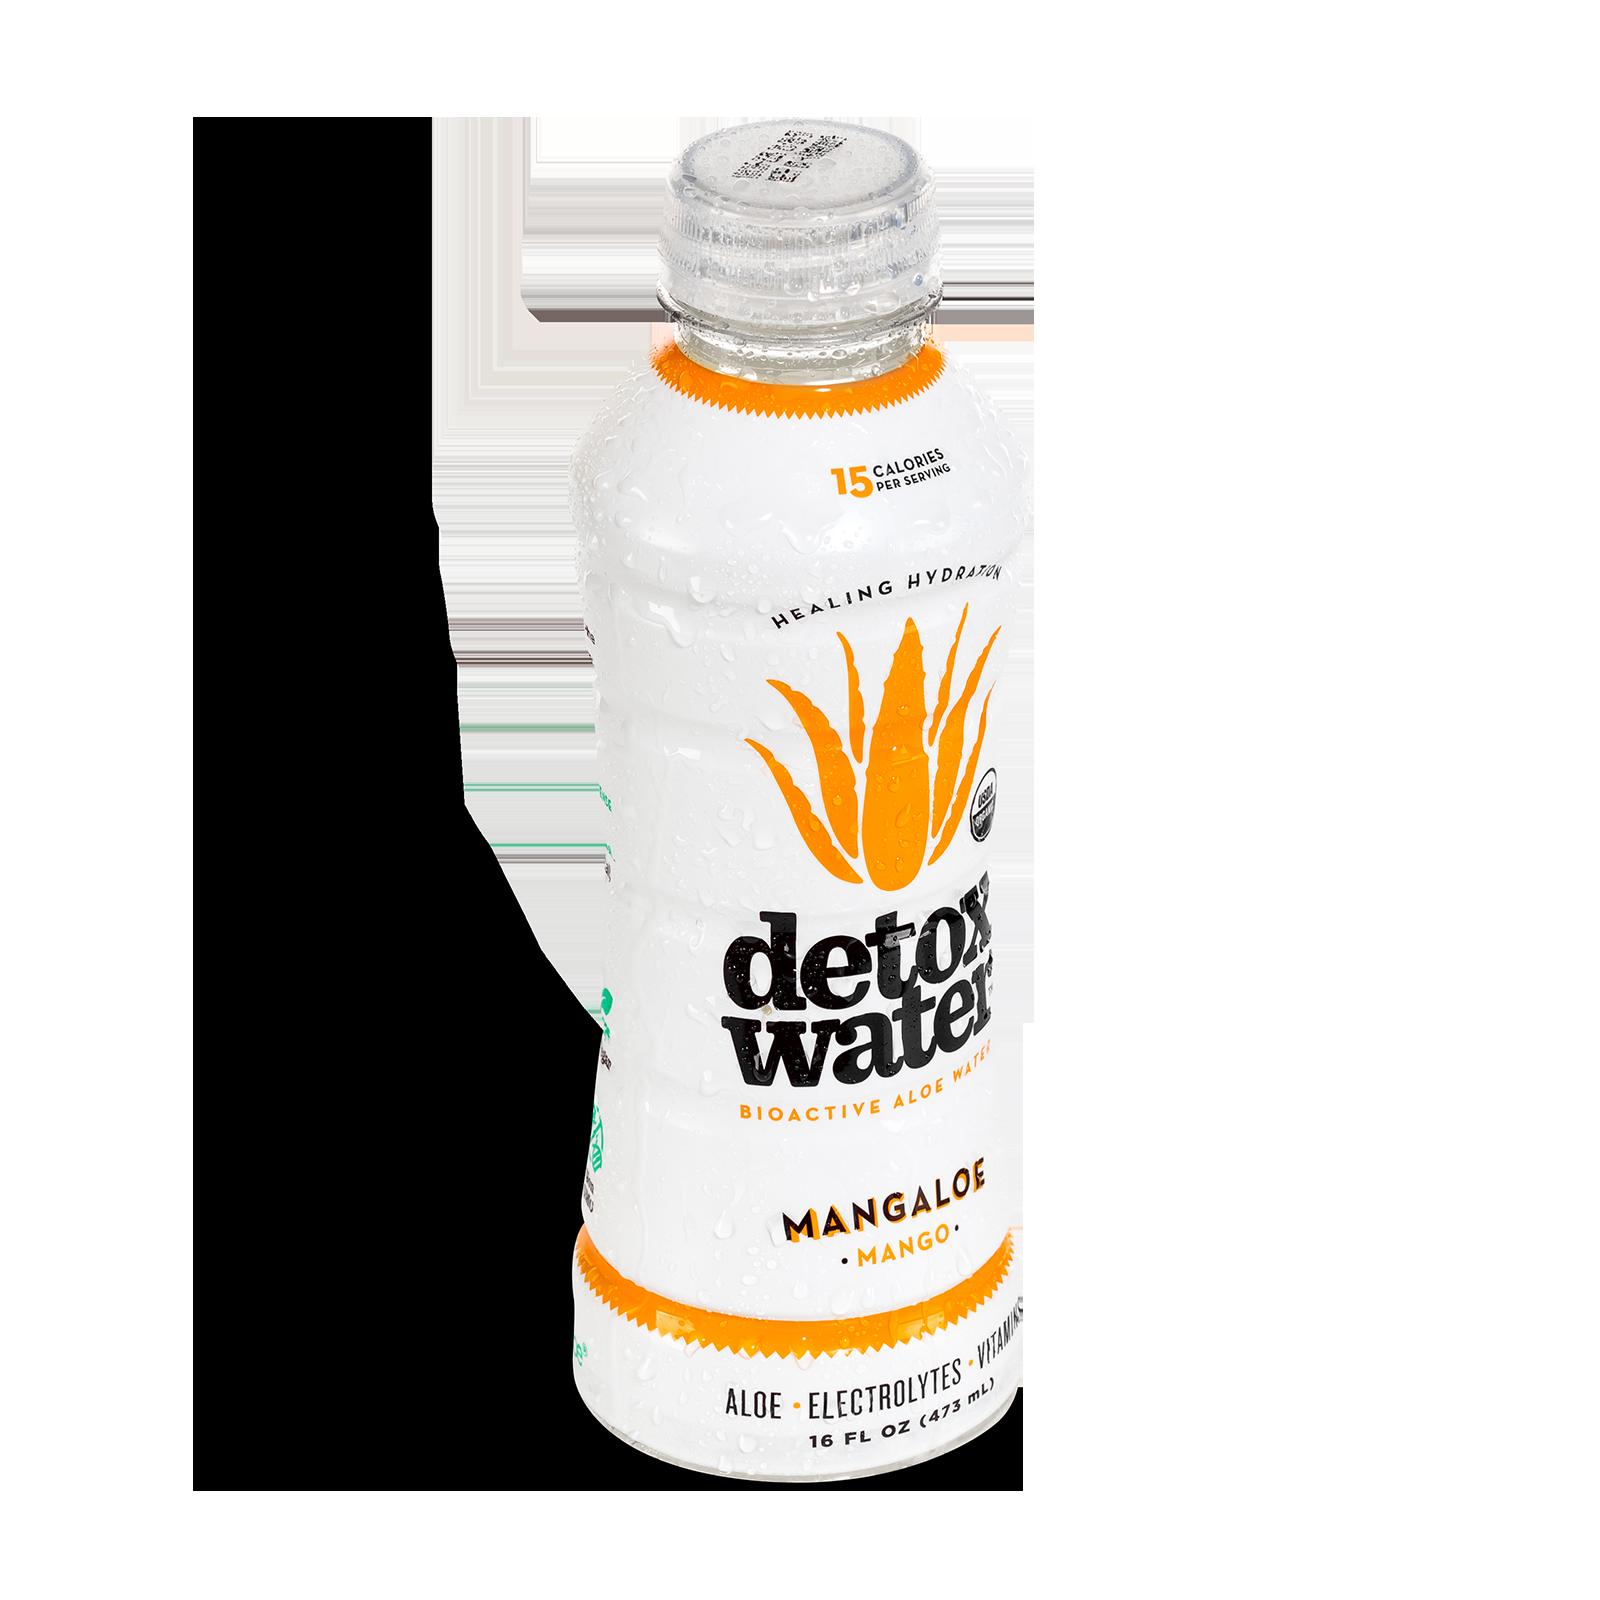 Beverage product image